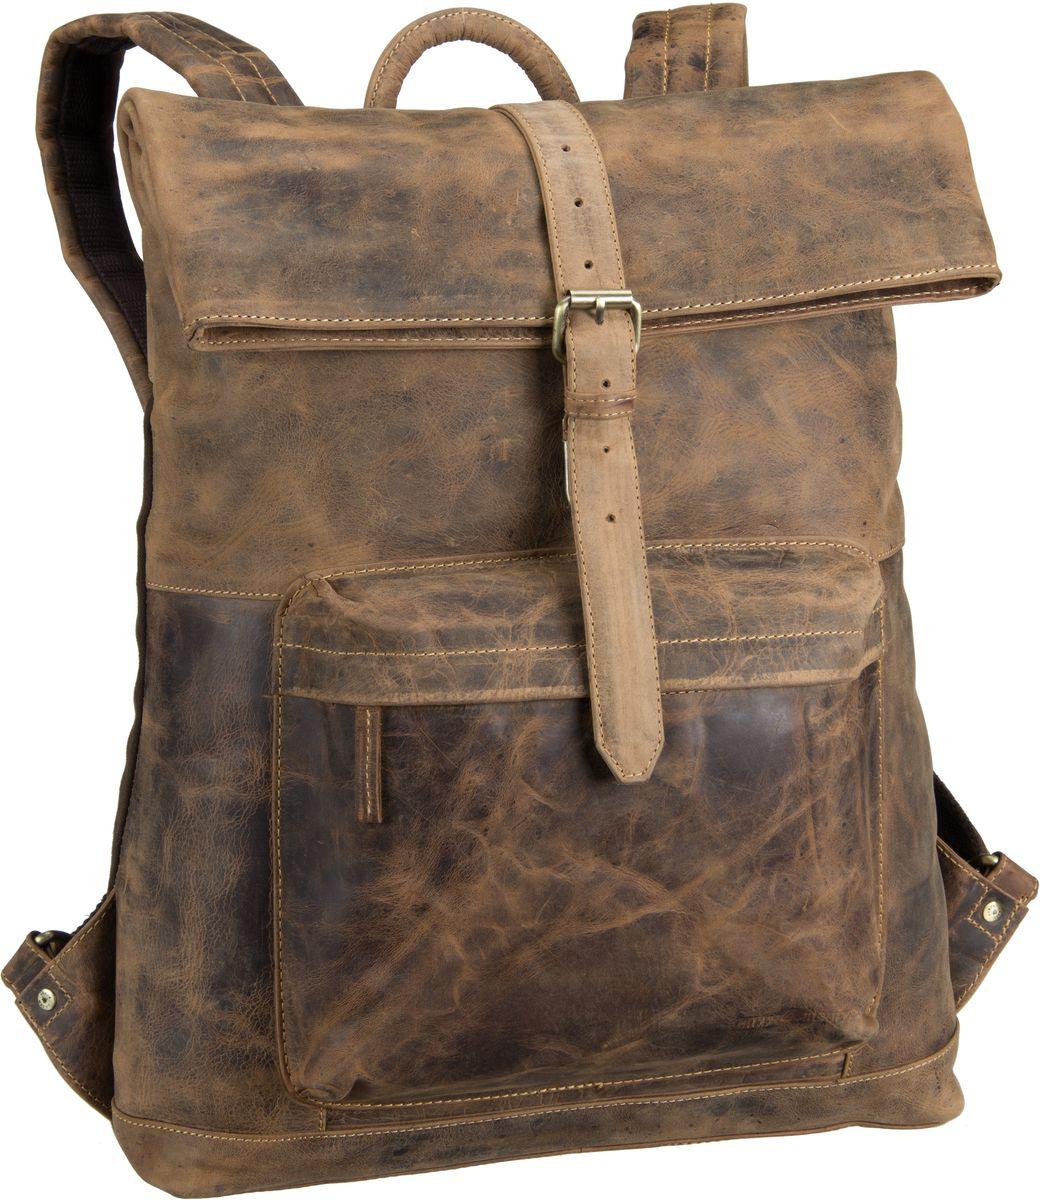 Rucksack / Daypack Vintage 1671 Rucksack Brown